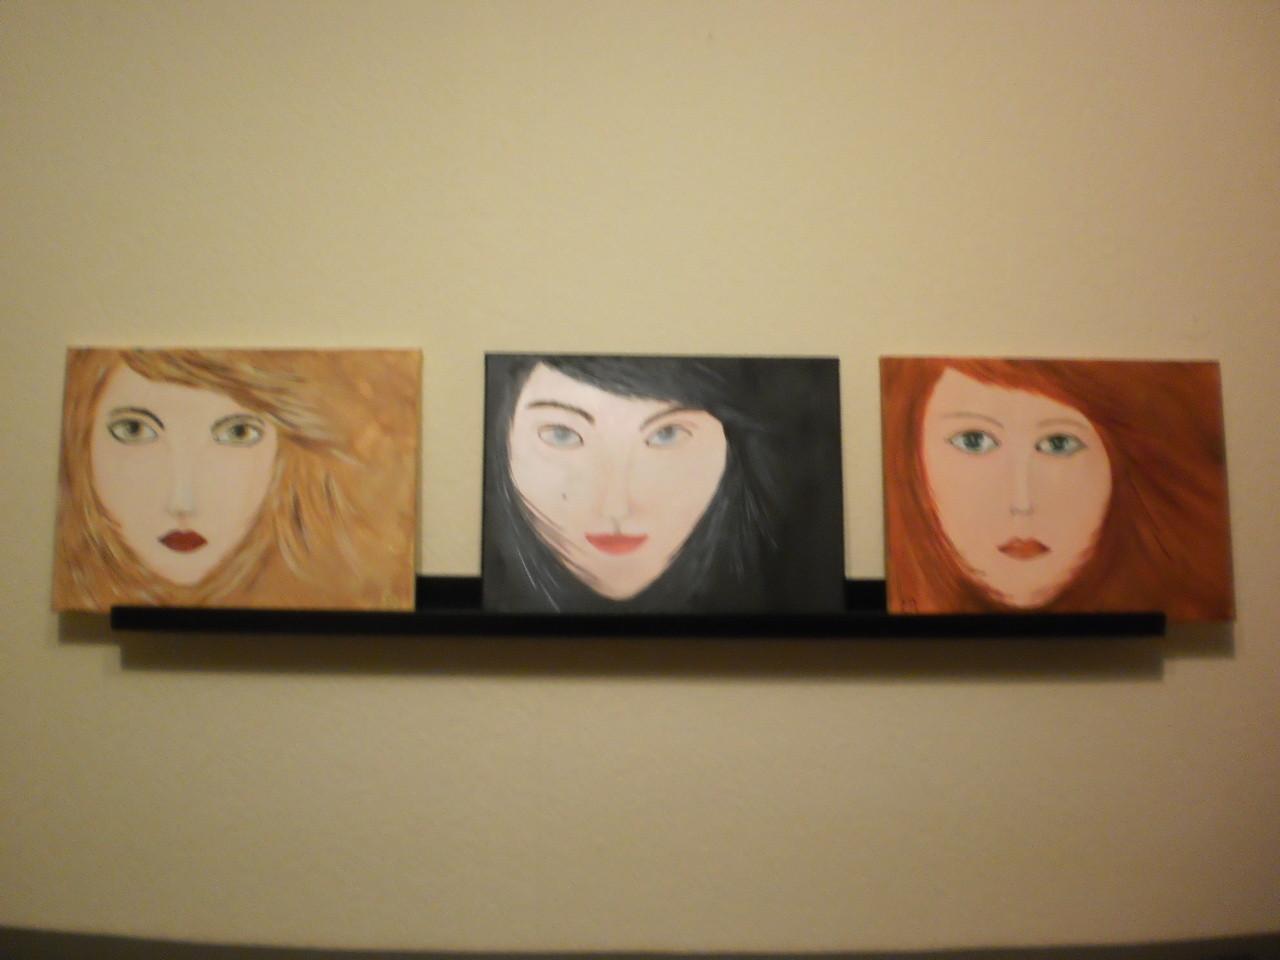 Frauenköpfe - 3 Stück je 40 x 30 cm - Acryl